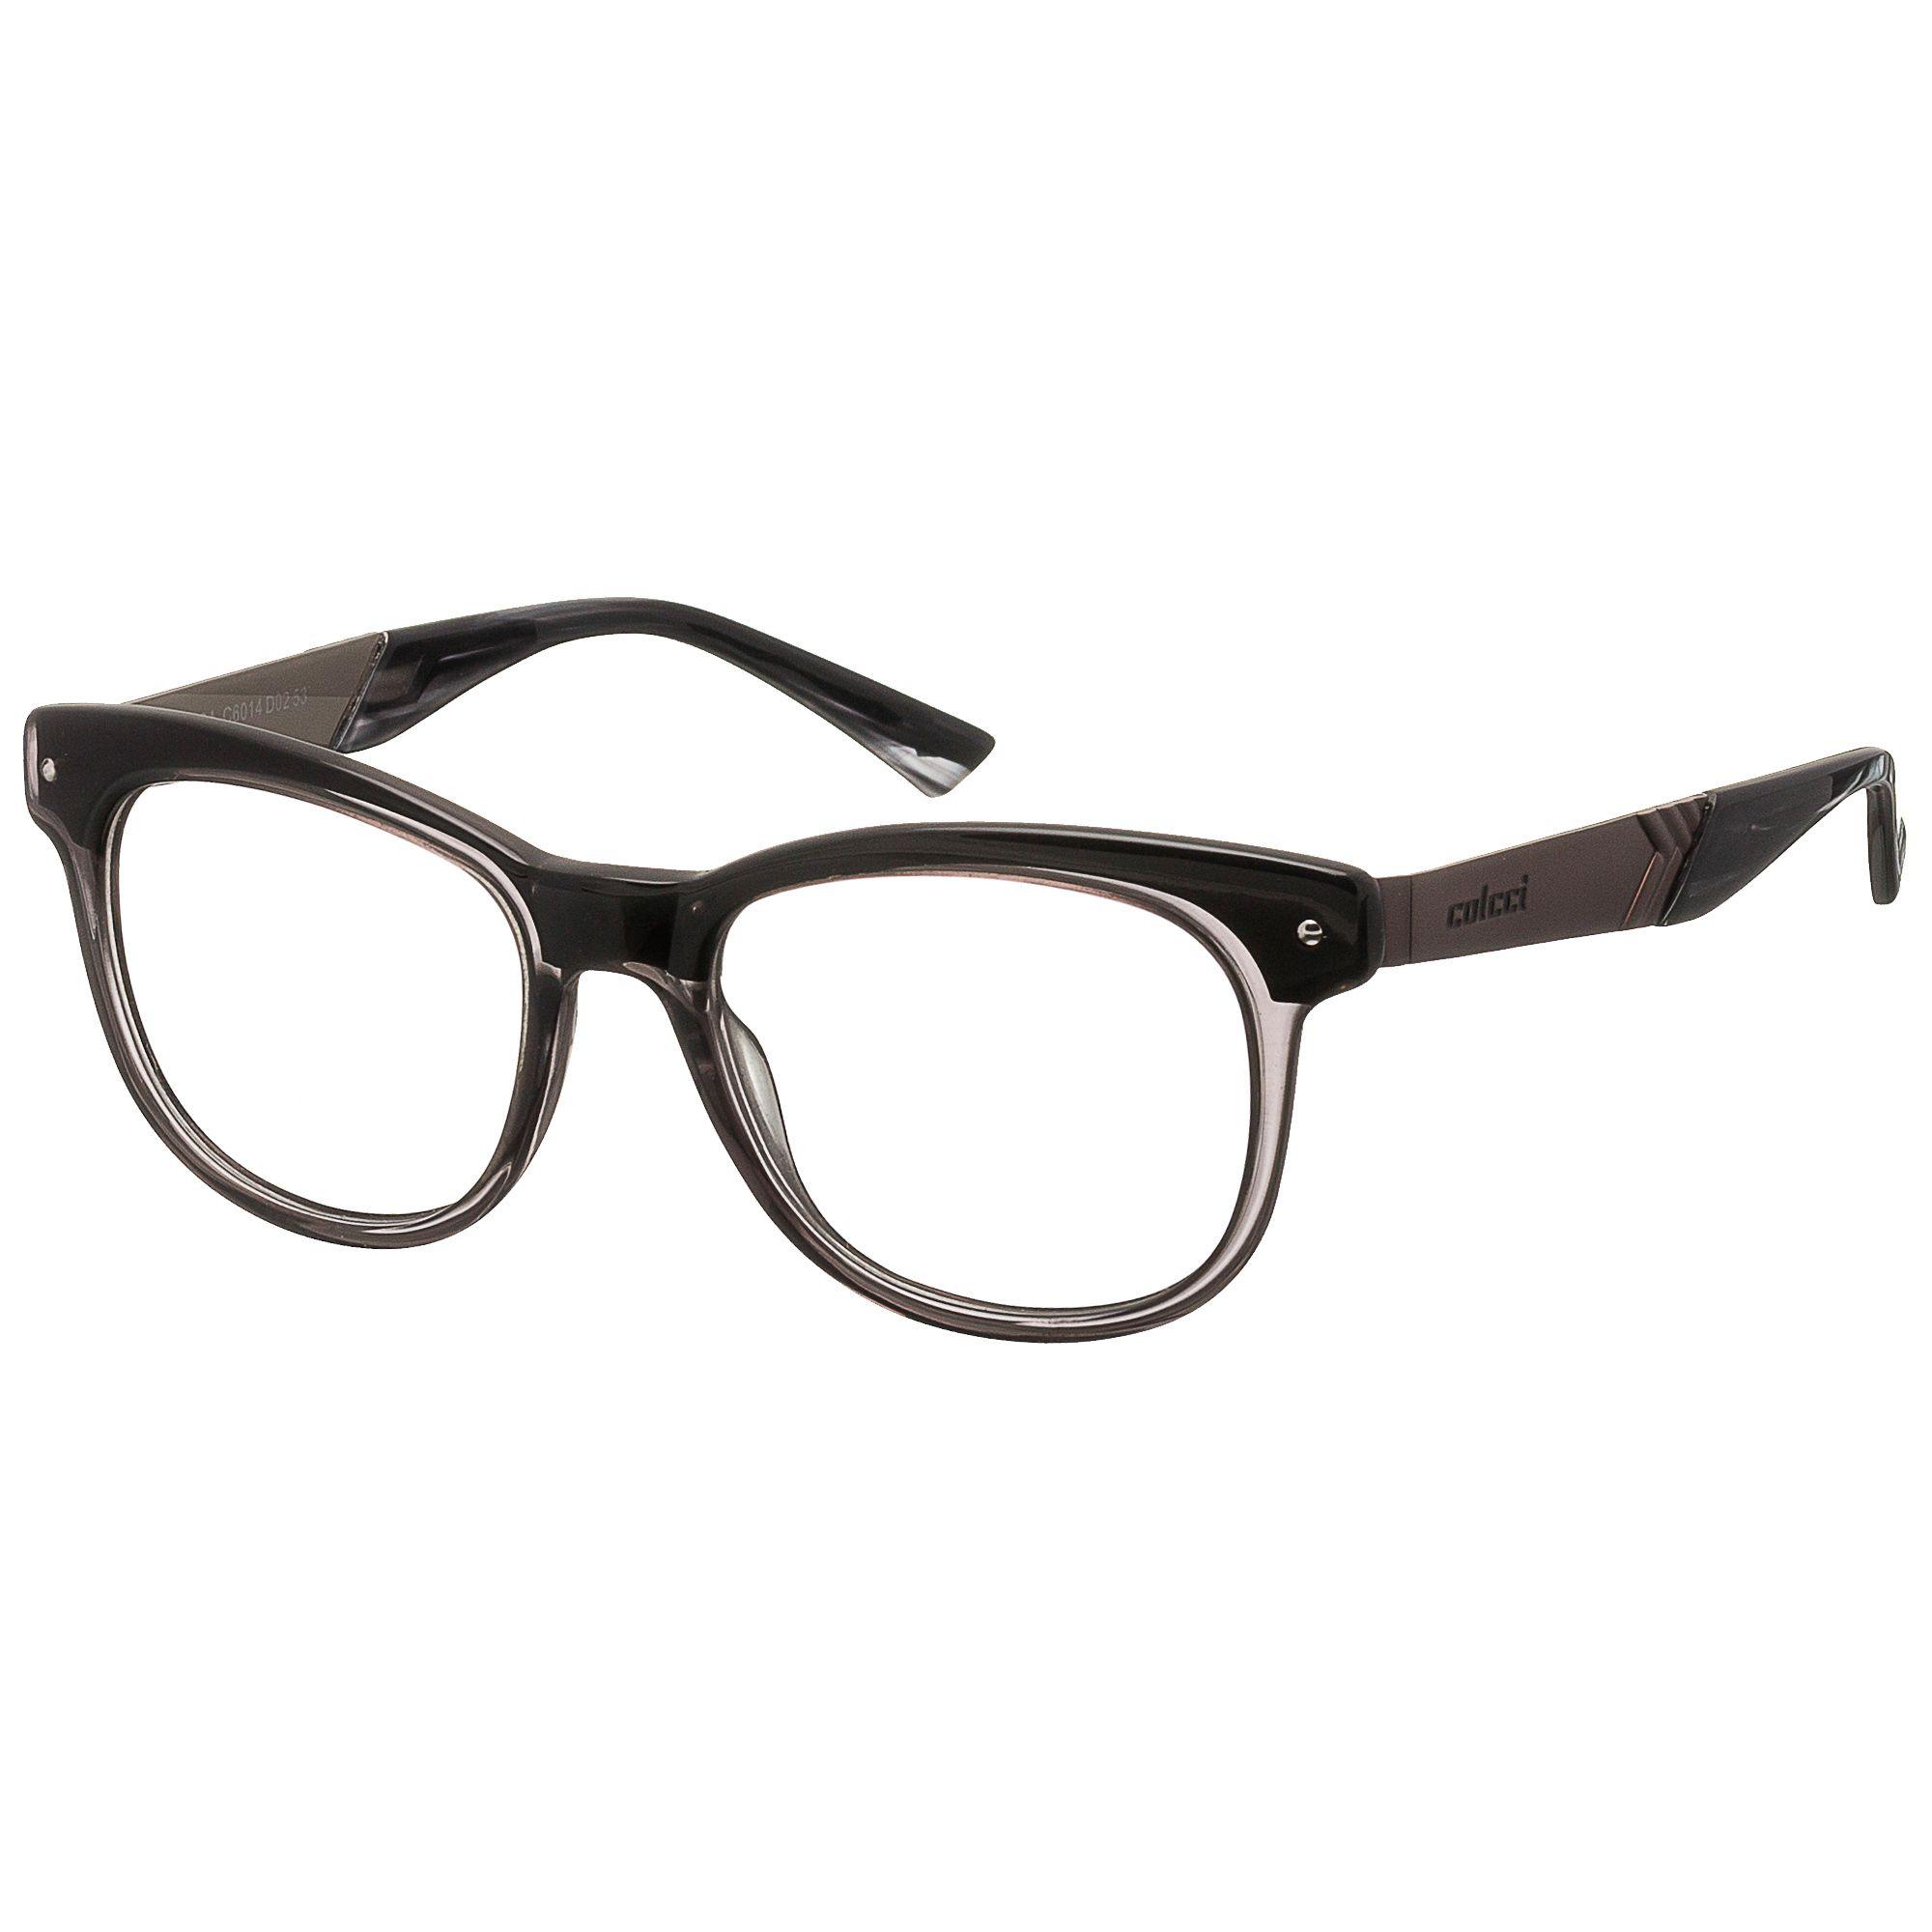 Óculos de Grau Feminino Colcci C6015D0251